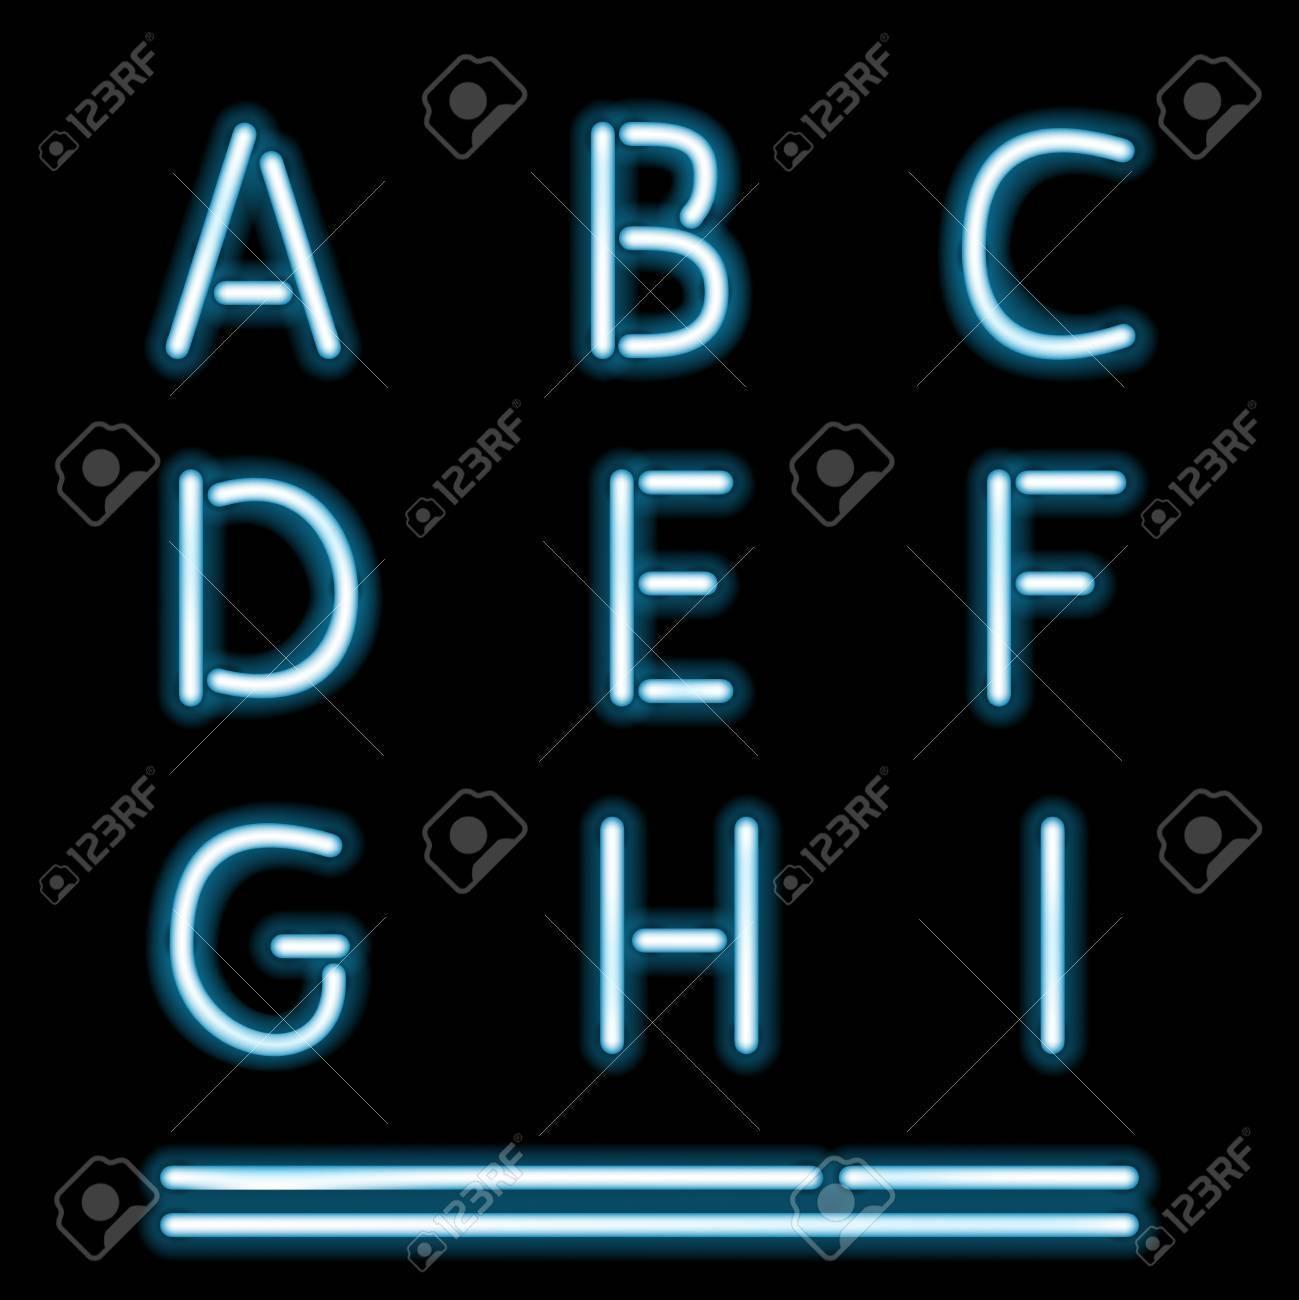 Vector Neon Tube Alphabet Letters, part 1 Stock Vector - 18383410